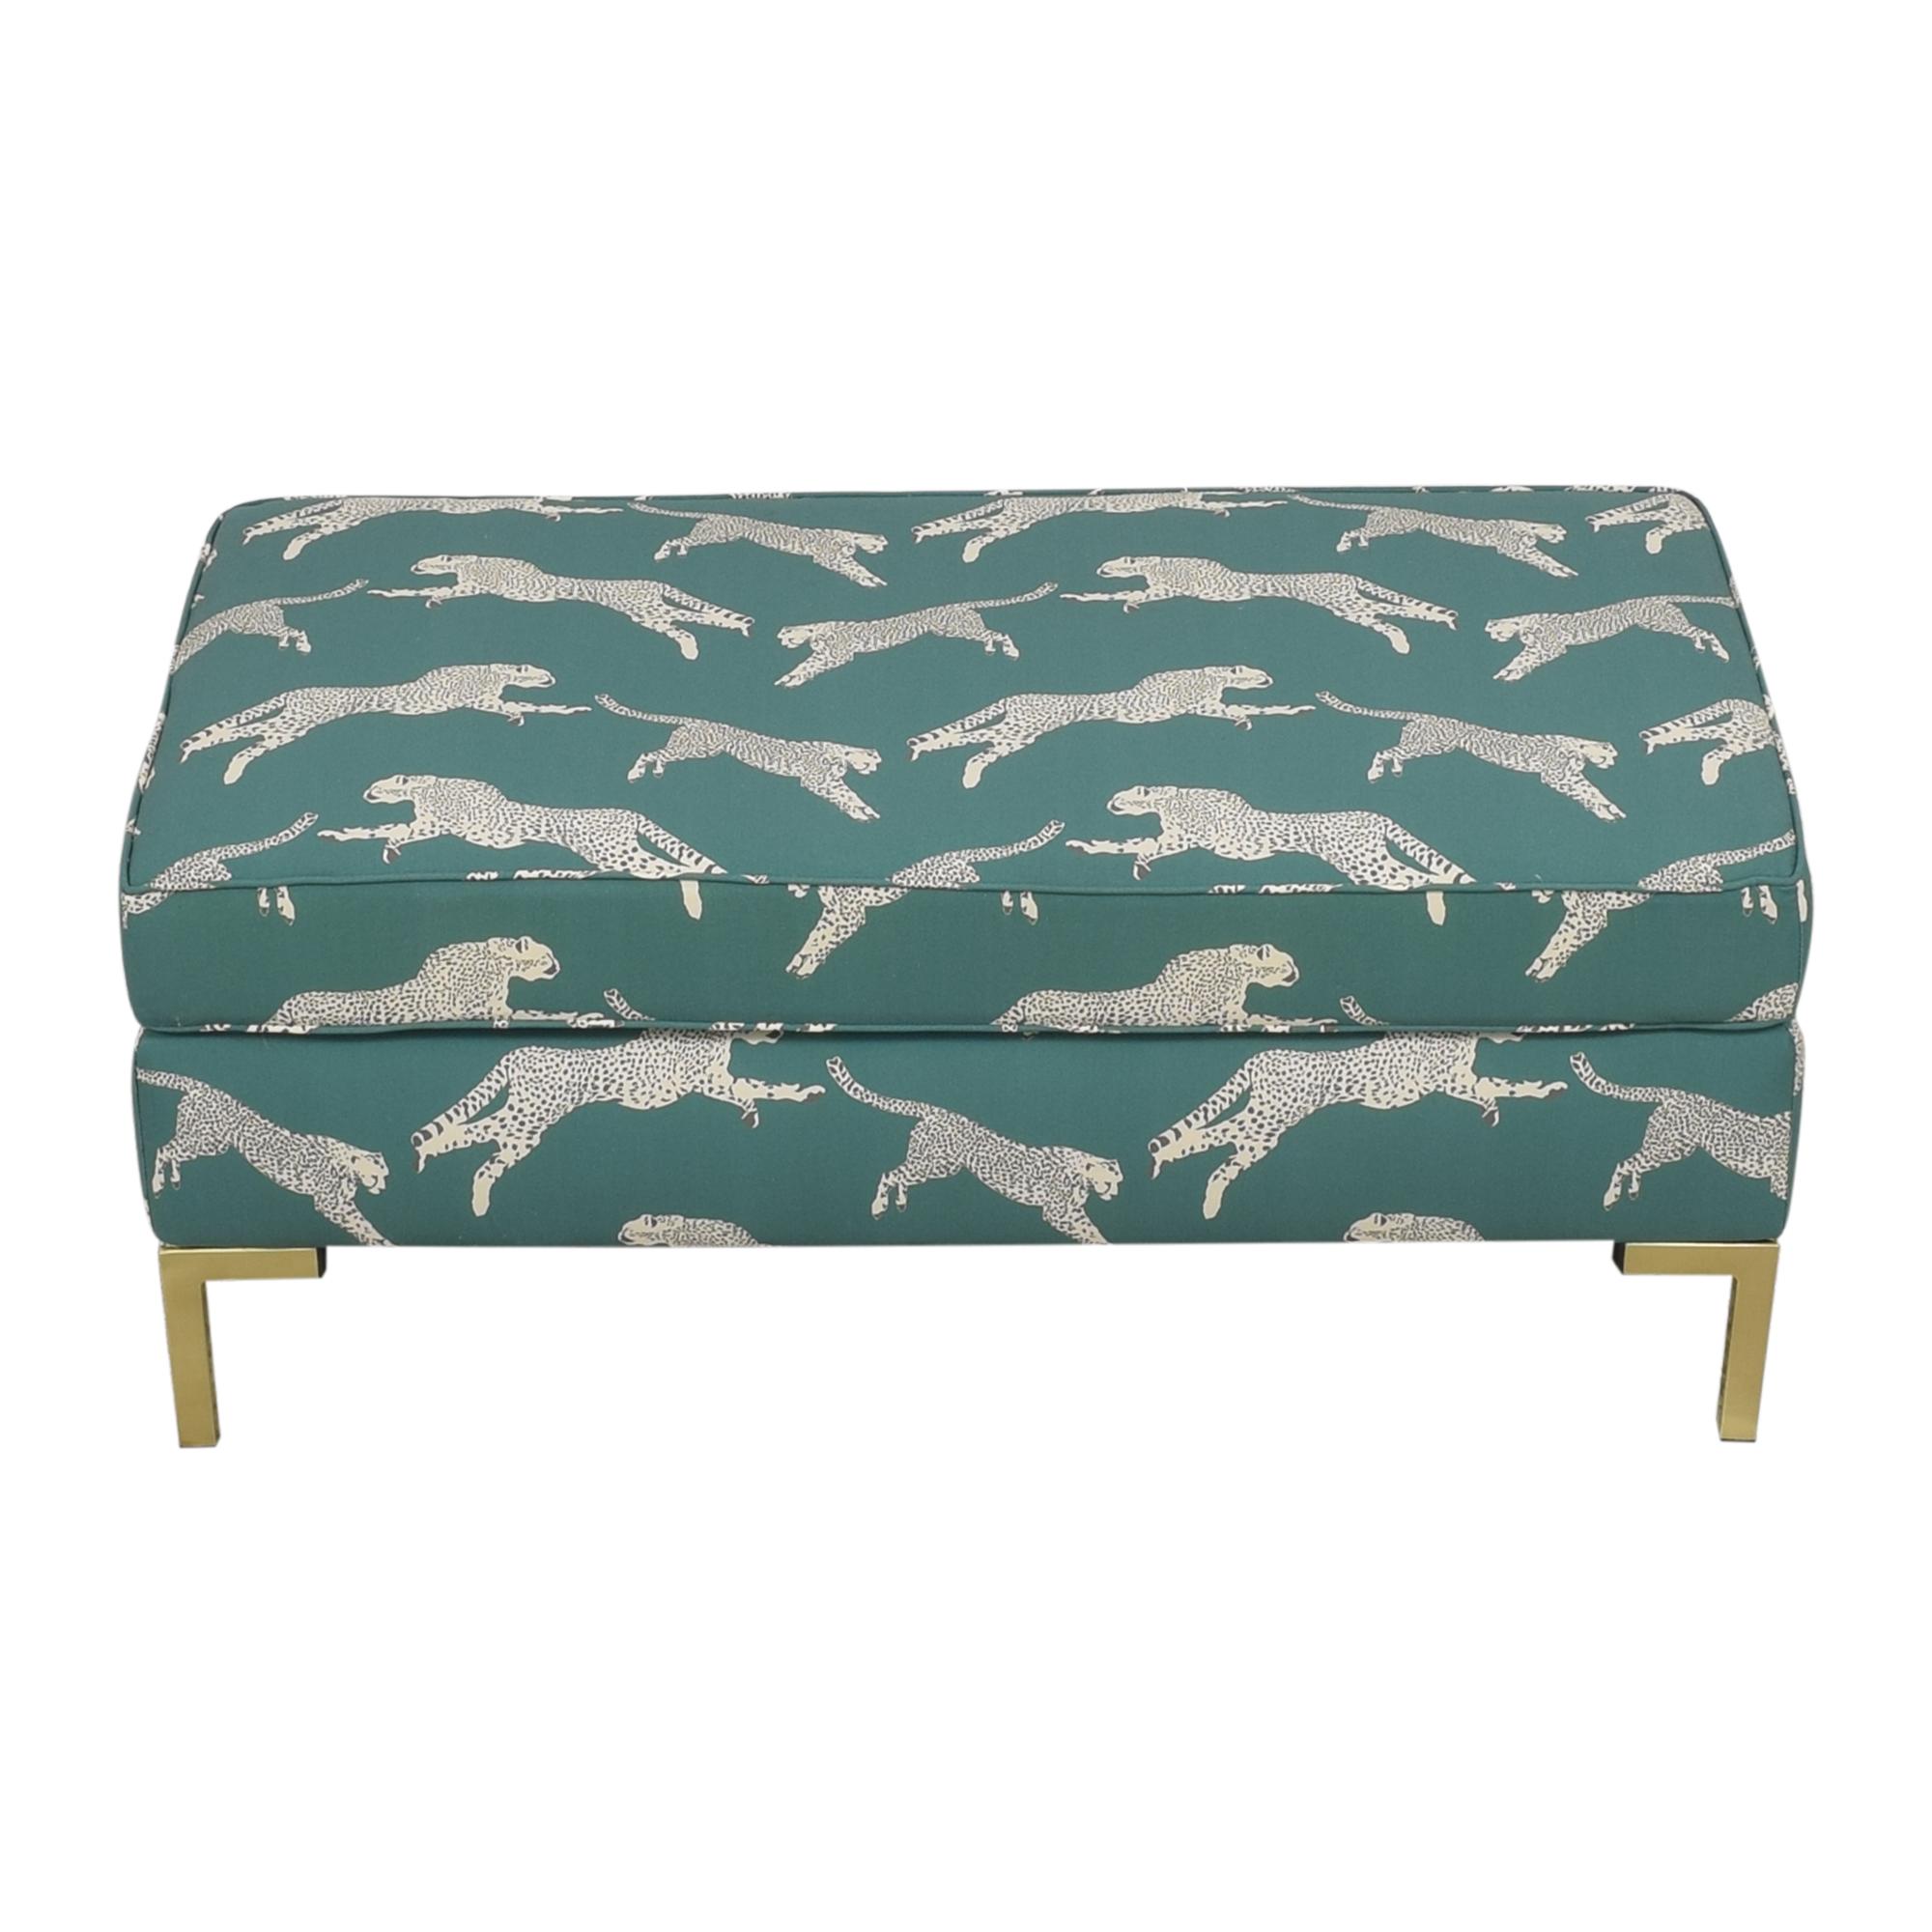 The Inside The Inside Polo Green Cheetah Modern Bench